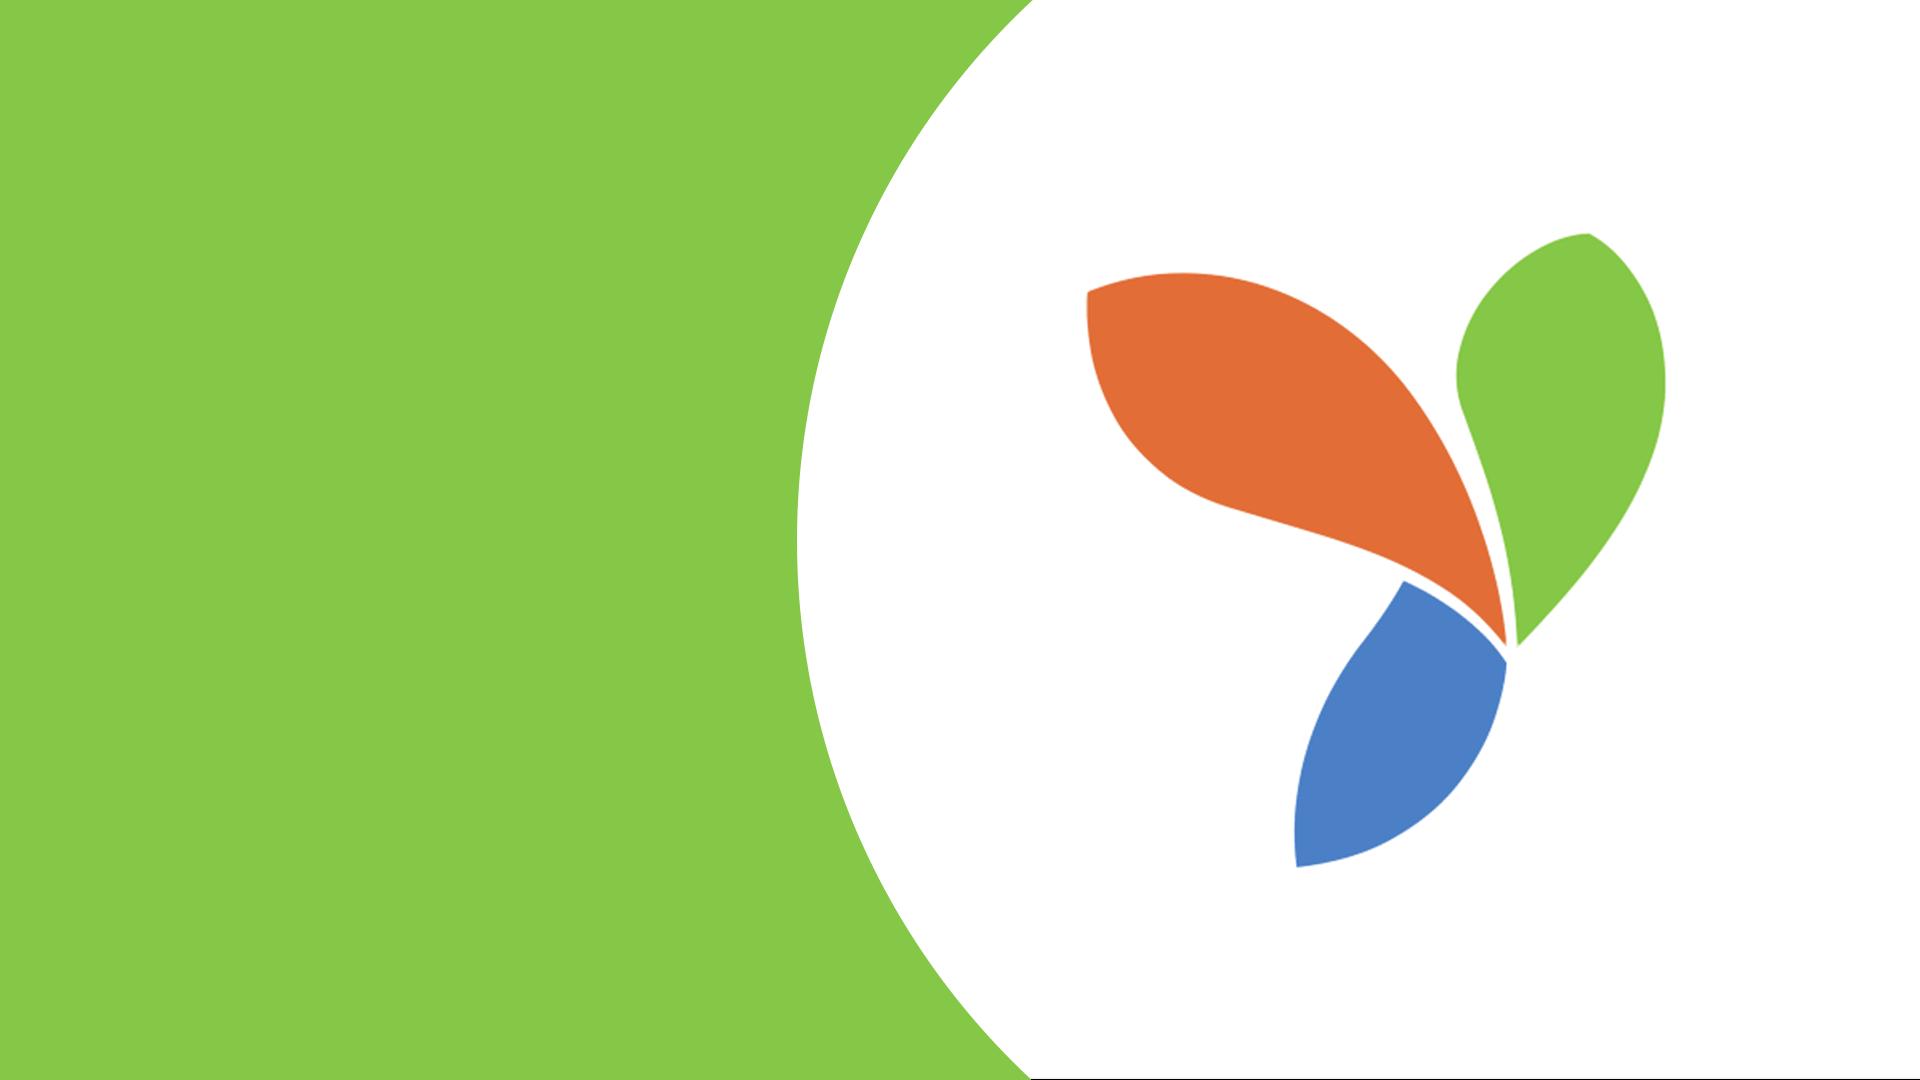 Zenetix. YII framework for web development